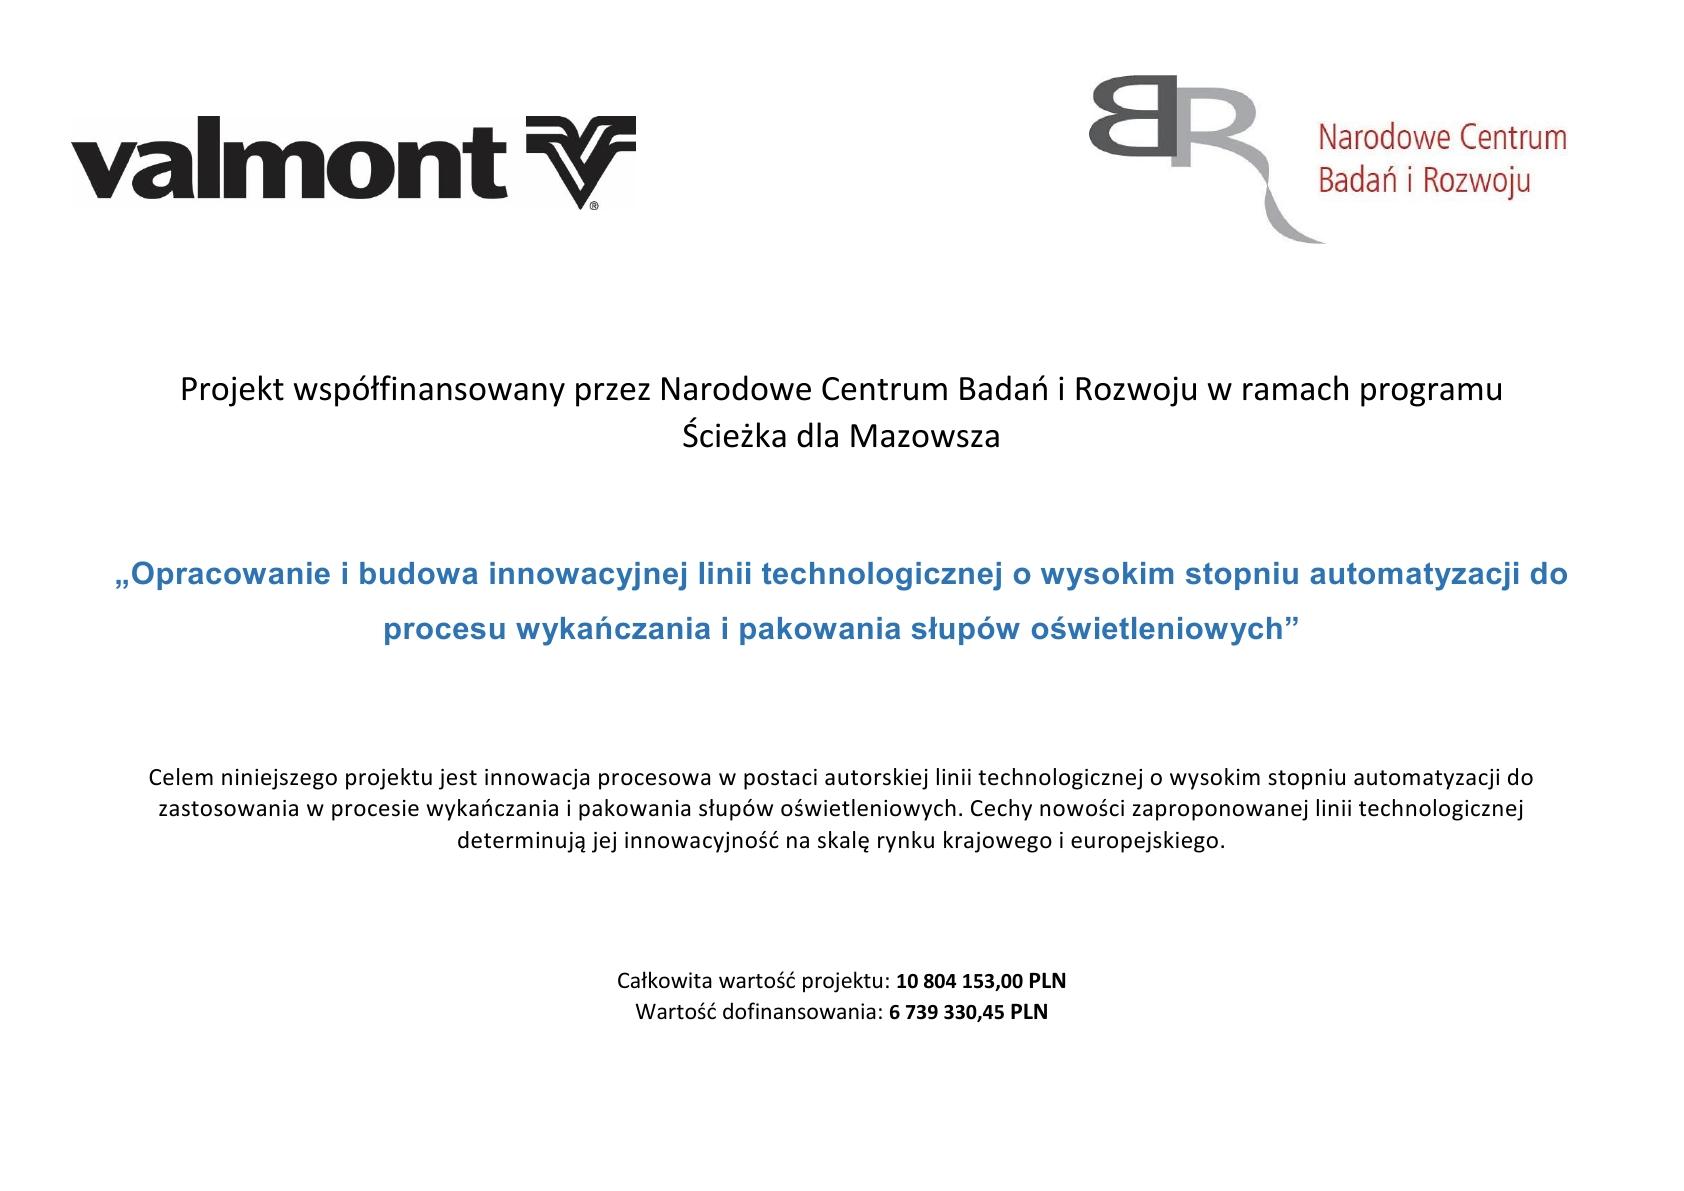 Valmont_linia_technologiczna_NCBR